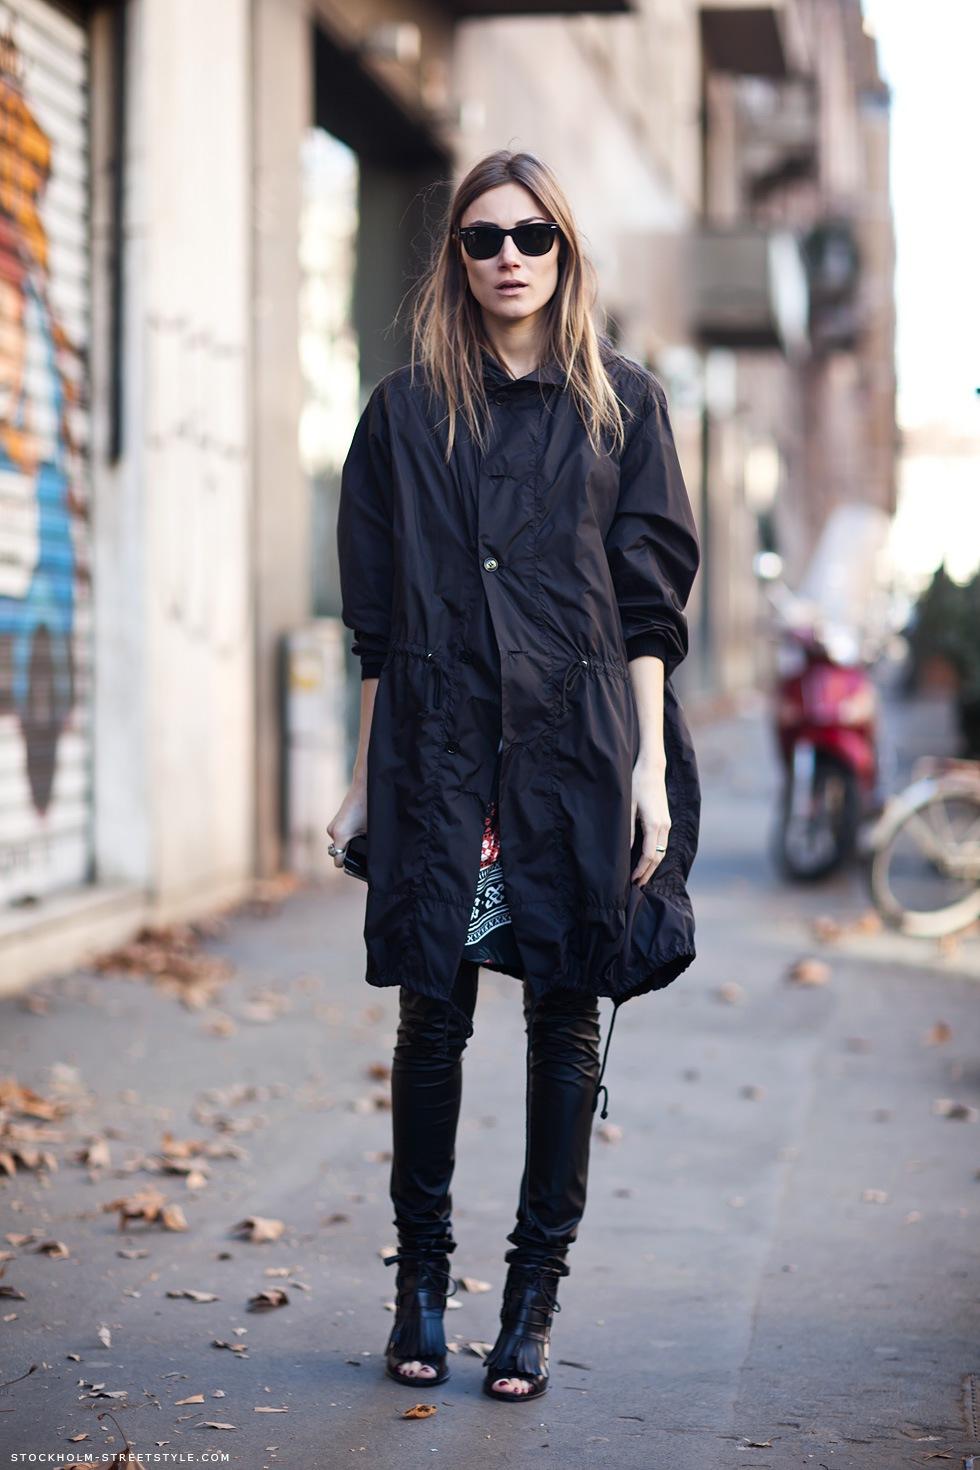 Parka coat - Stockholm Streetstyle